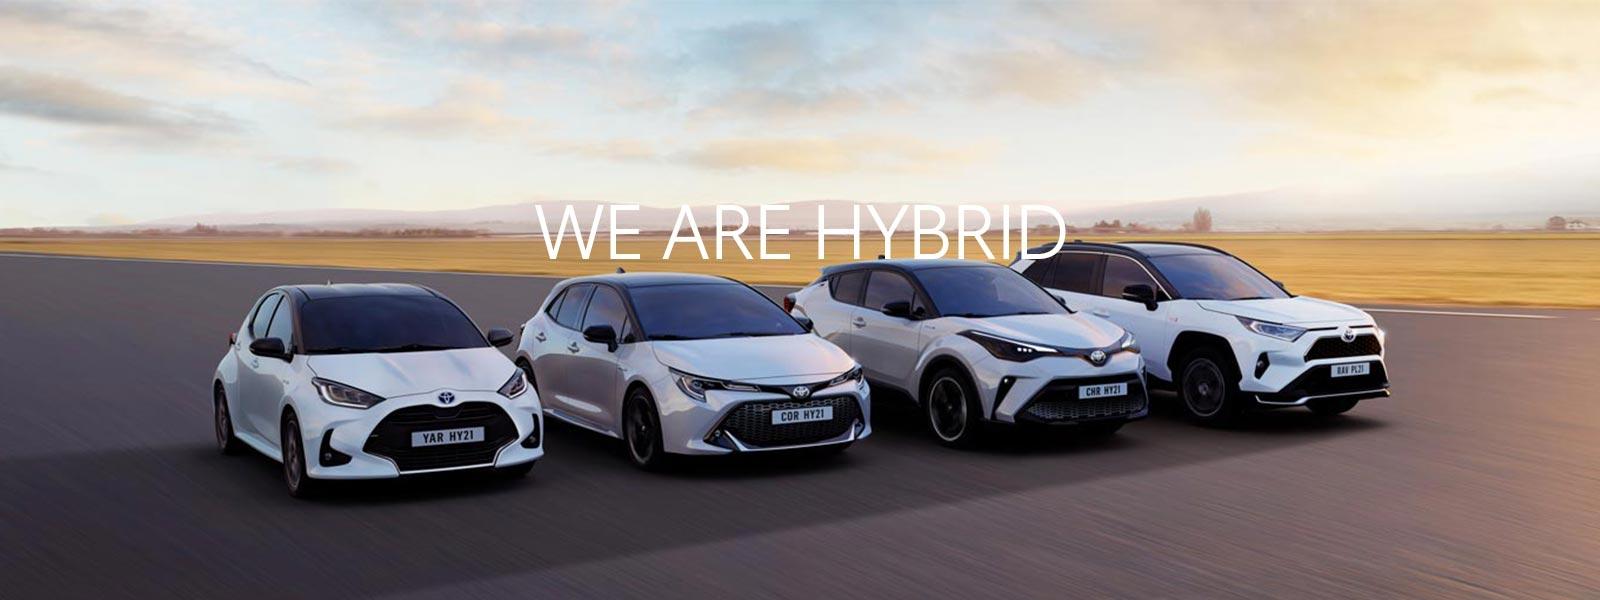 We Are Hybrid